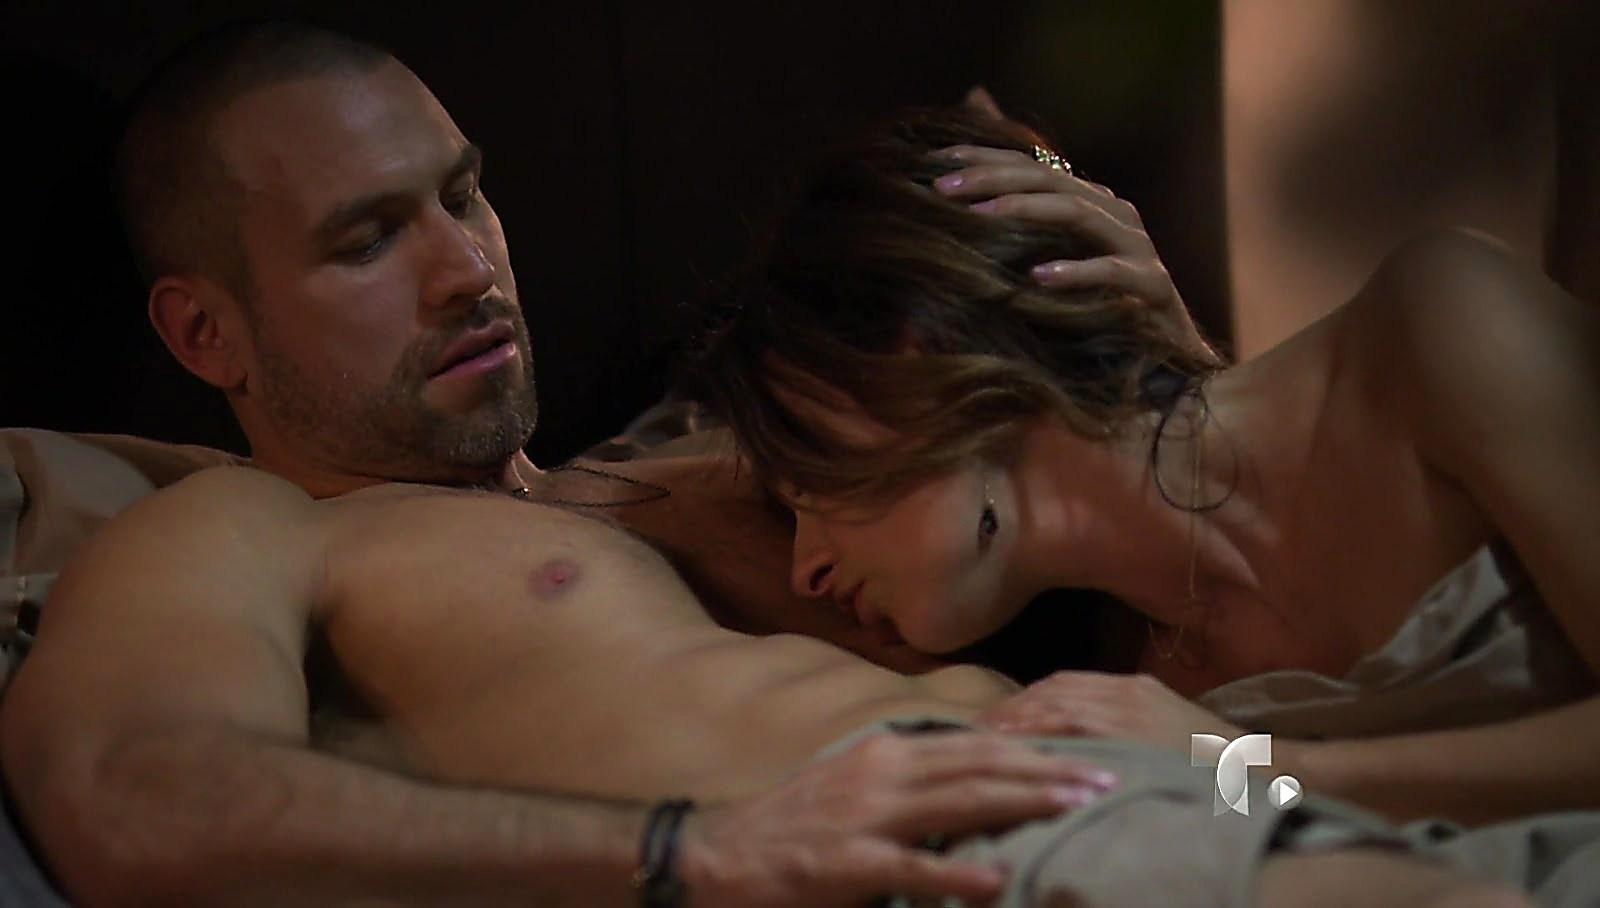 Rafael Amaya sexy shirtless scene August 24, 2017, 1pm